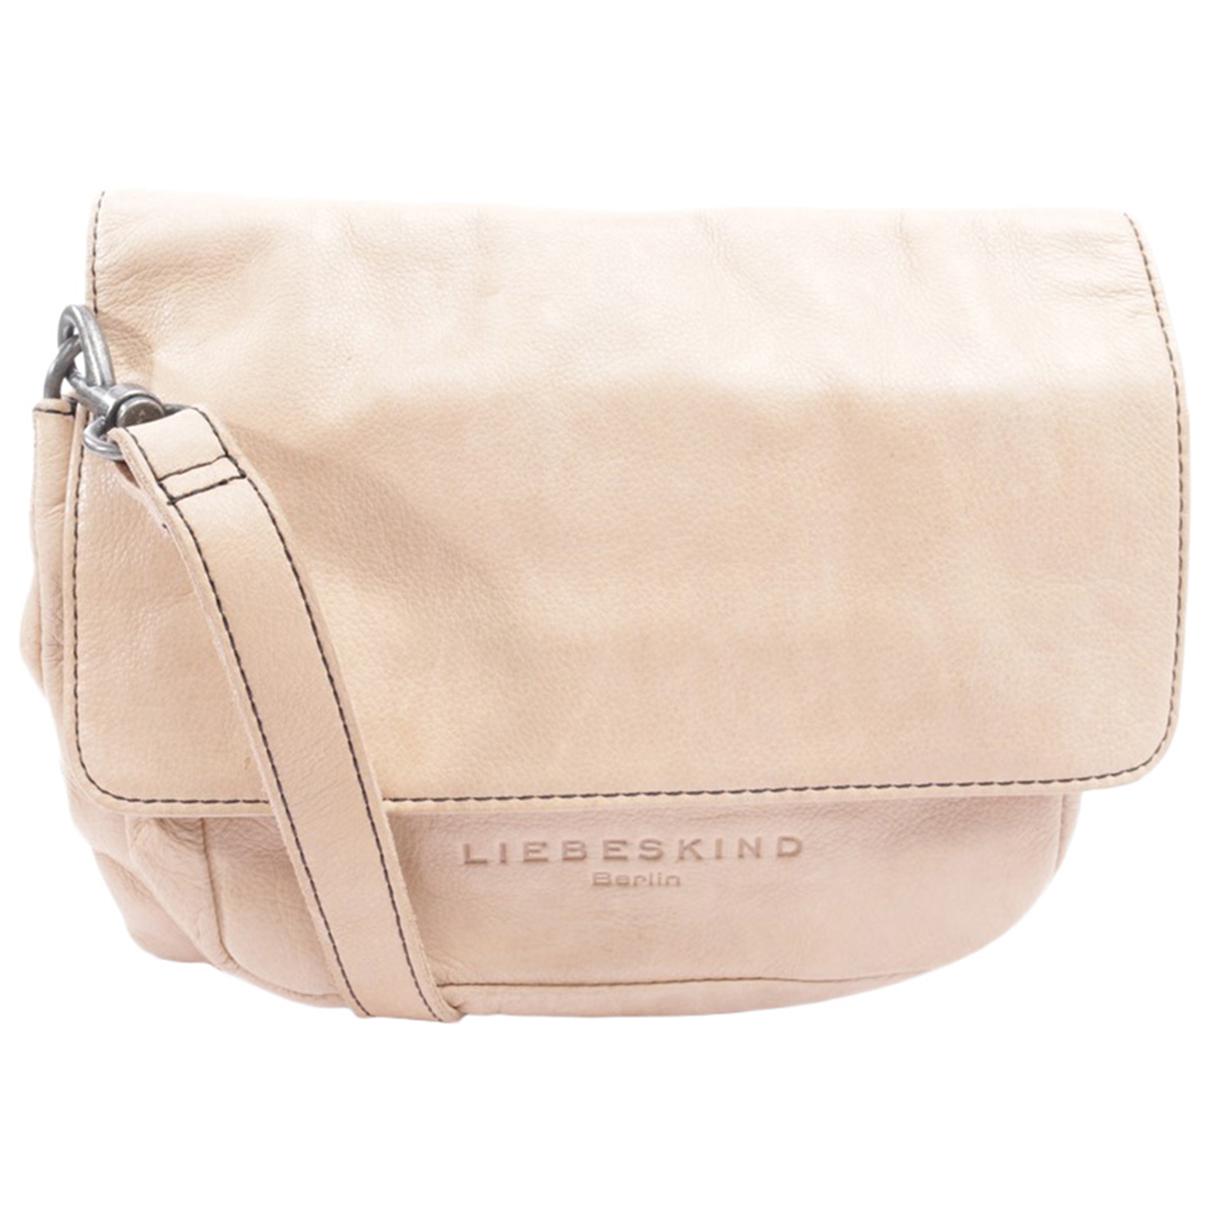 Autre Marque \N Beige Leather handbag for Women \N